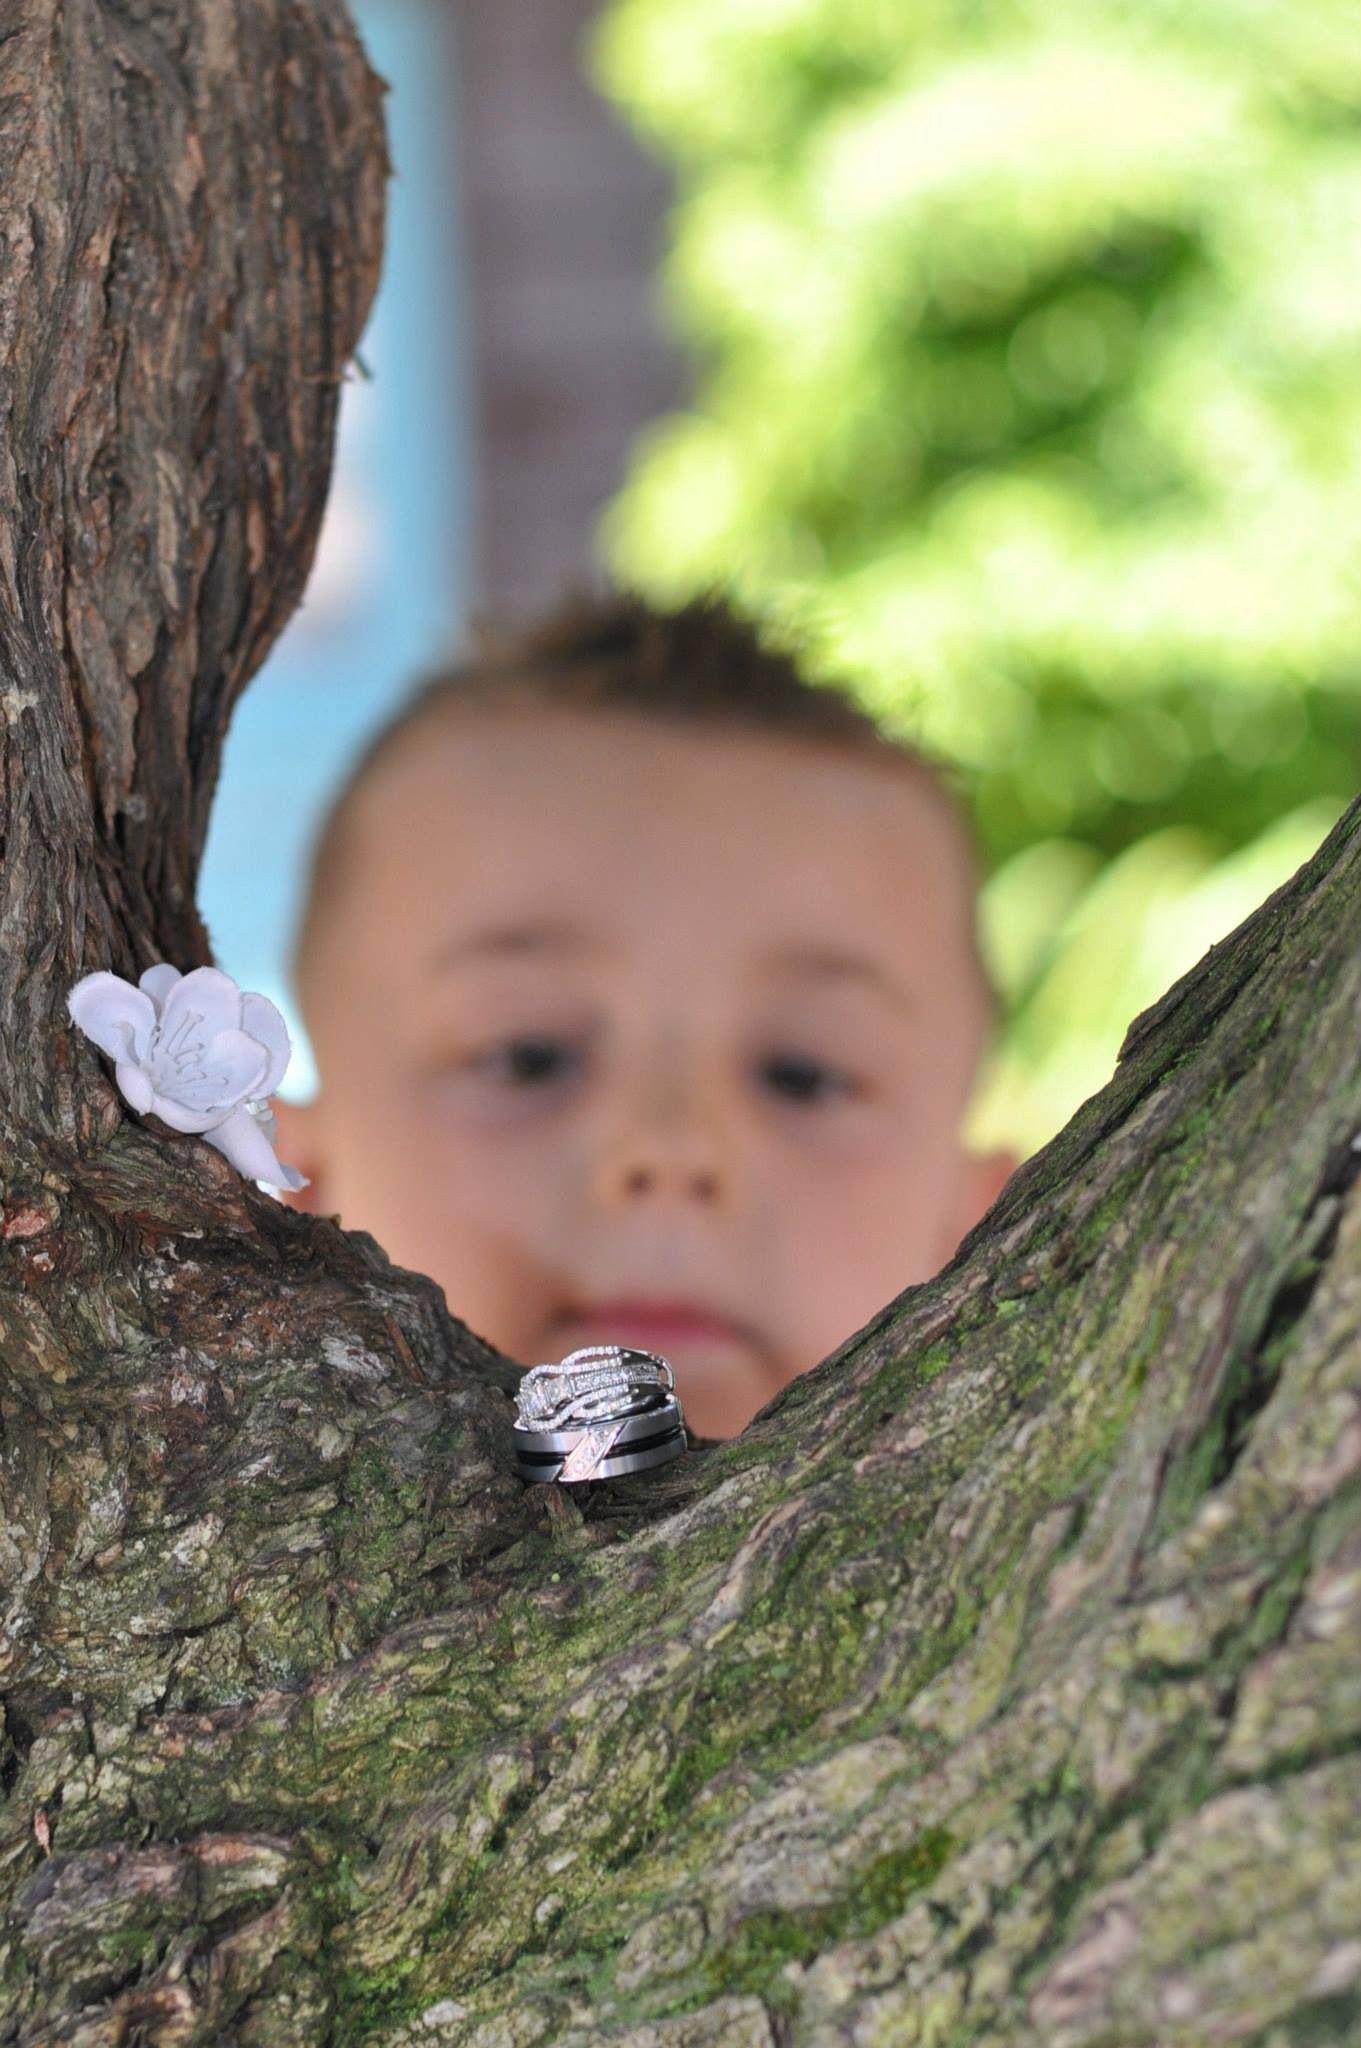 ring bearer wedding rings in tree blurred out ring bearer focus on rjngs